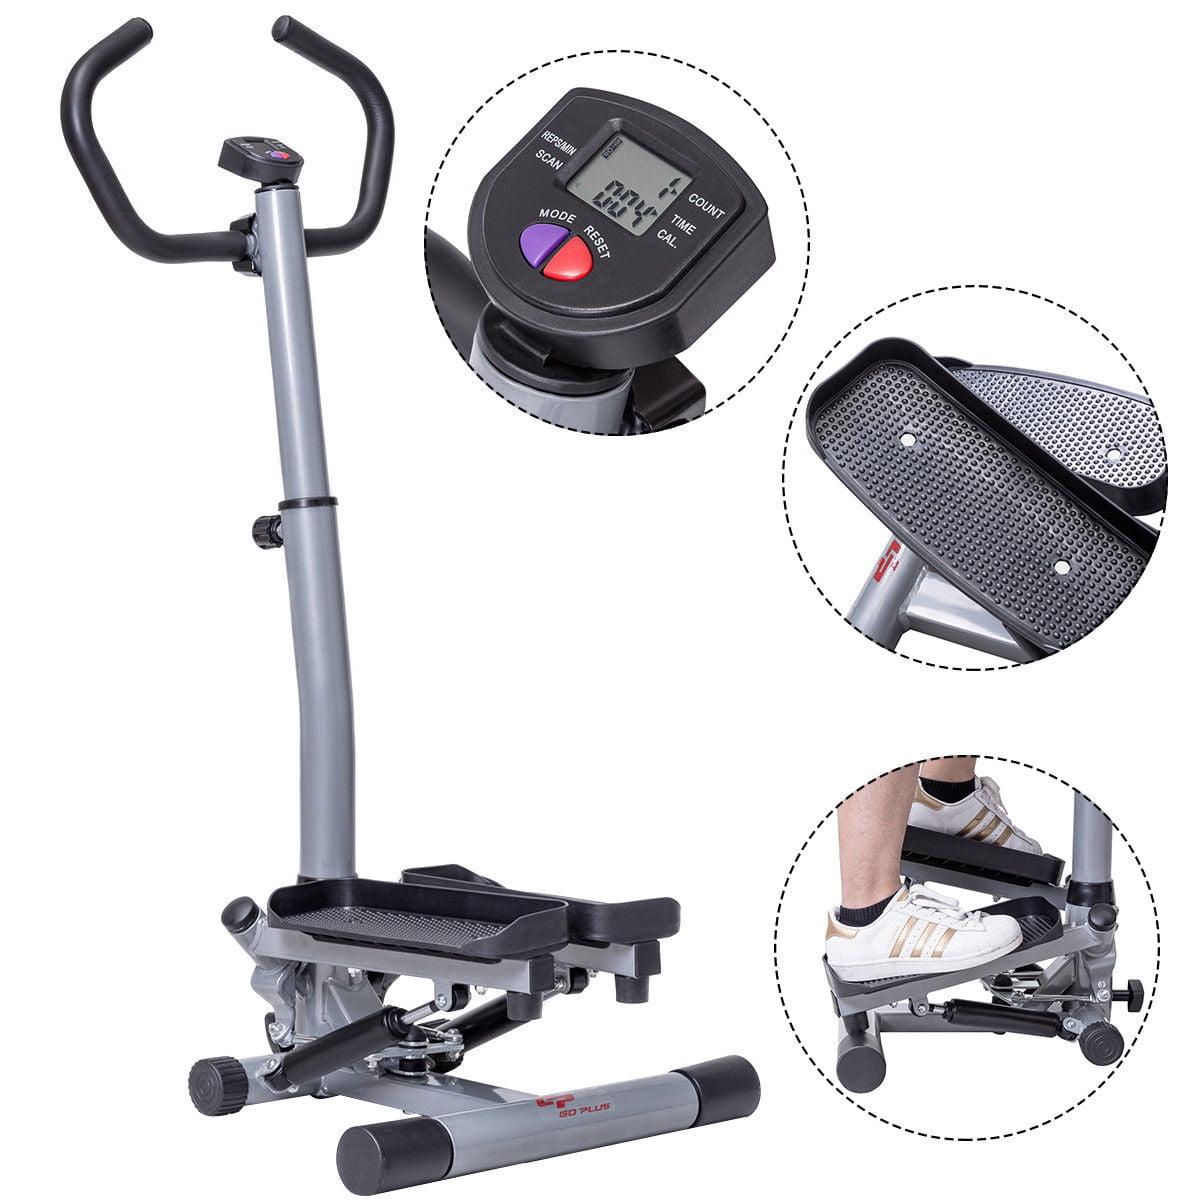 GHP Home/Gym Gray & Black Adjusable Twist Stepper Workout Machine w LCD Display